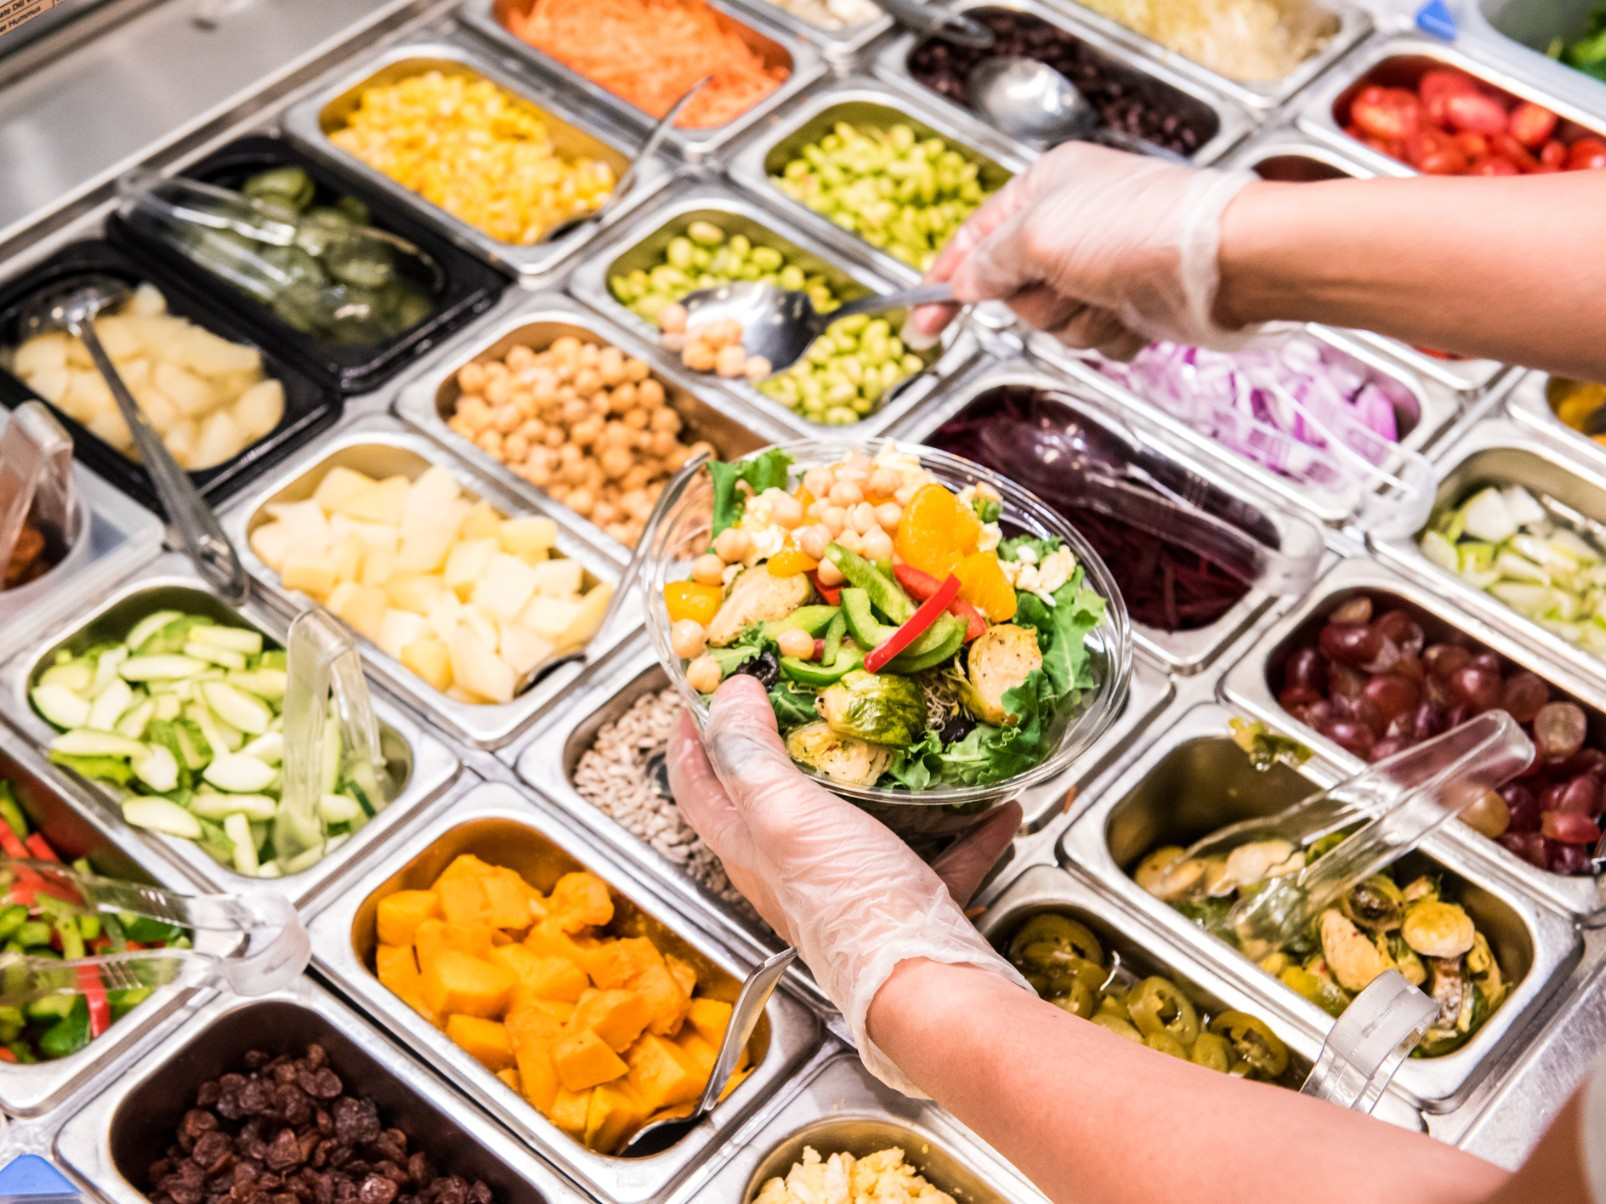 SaladStop! (Tanglin Mall) - Dine, Shop, Earn